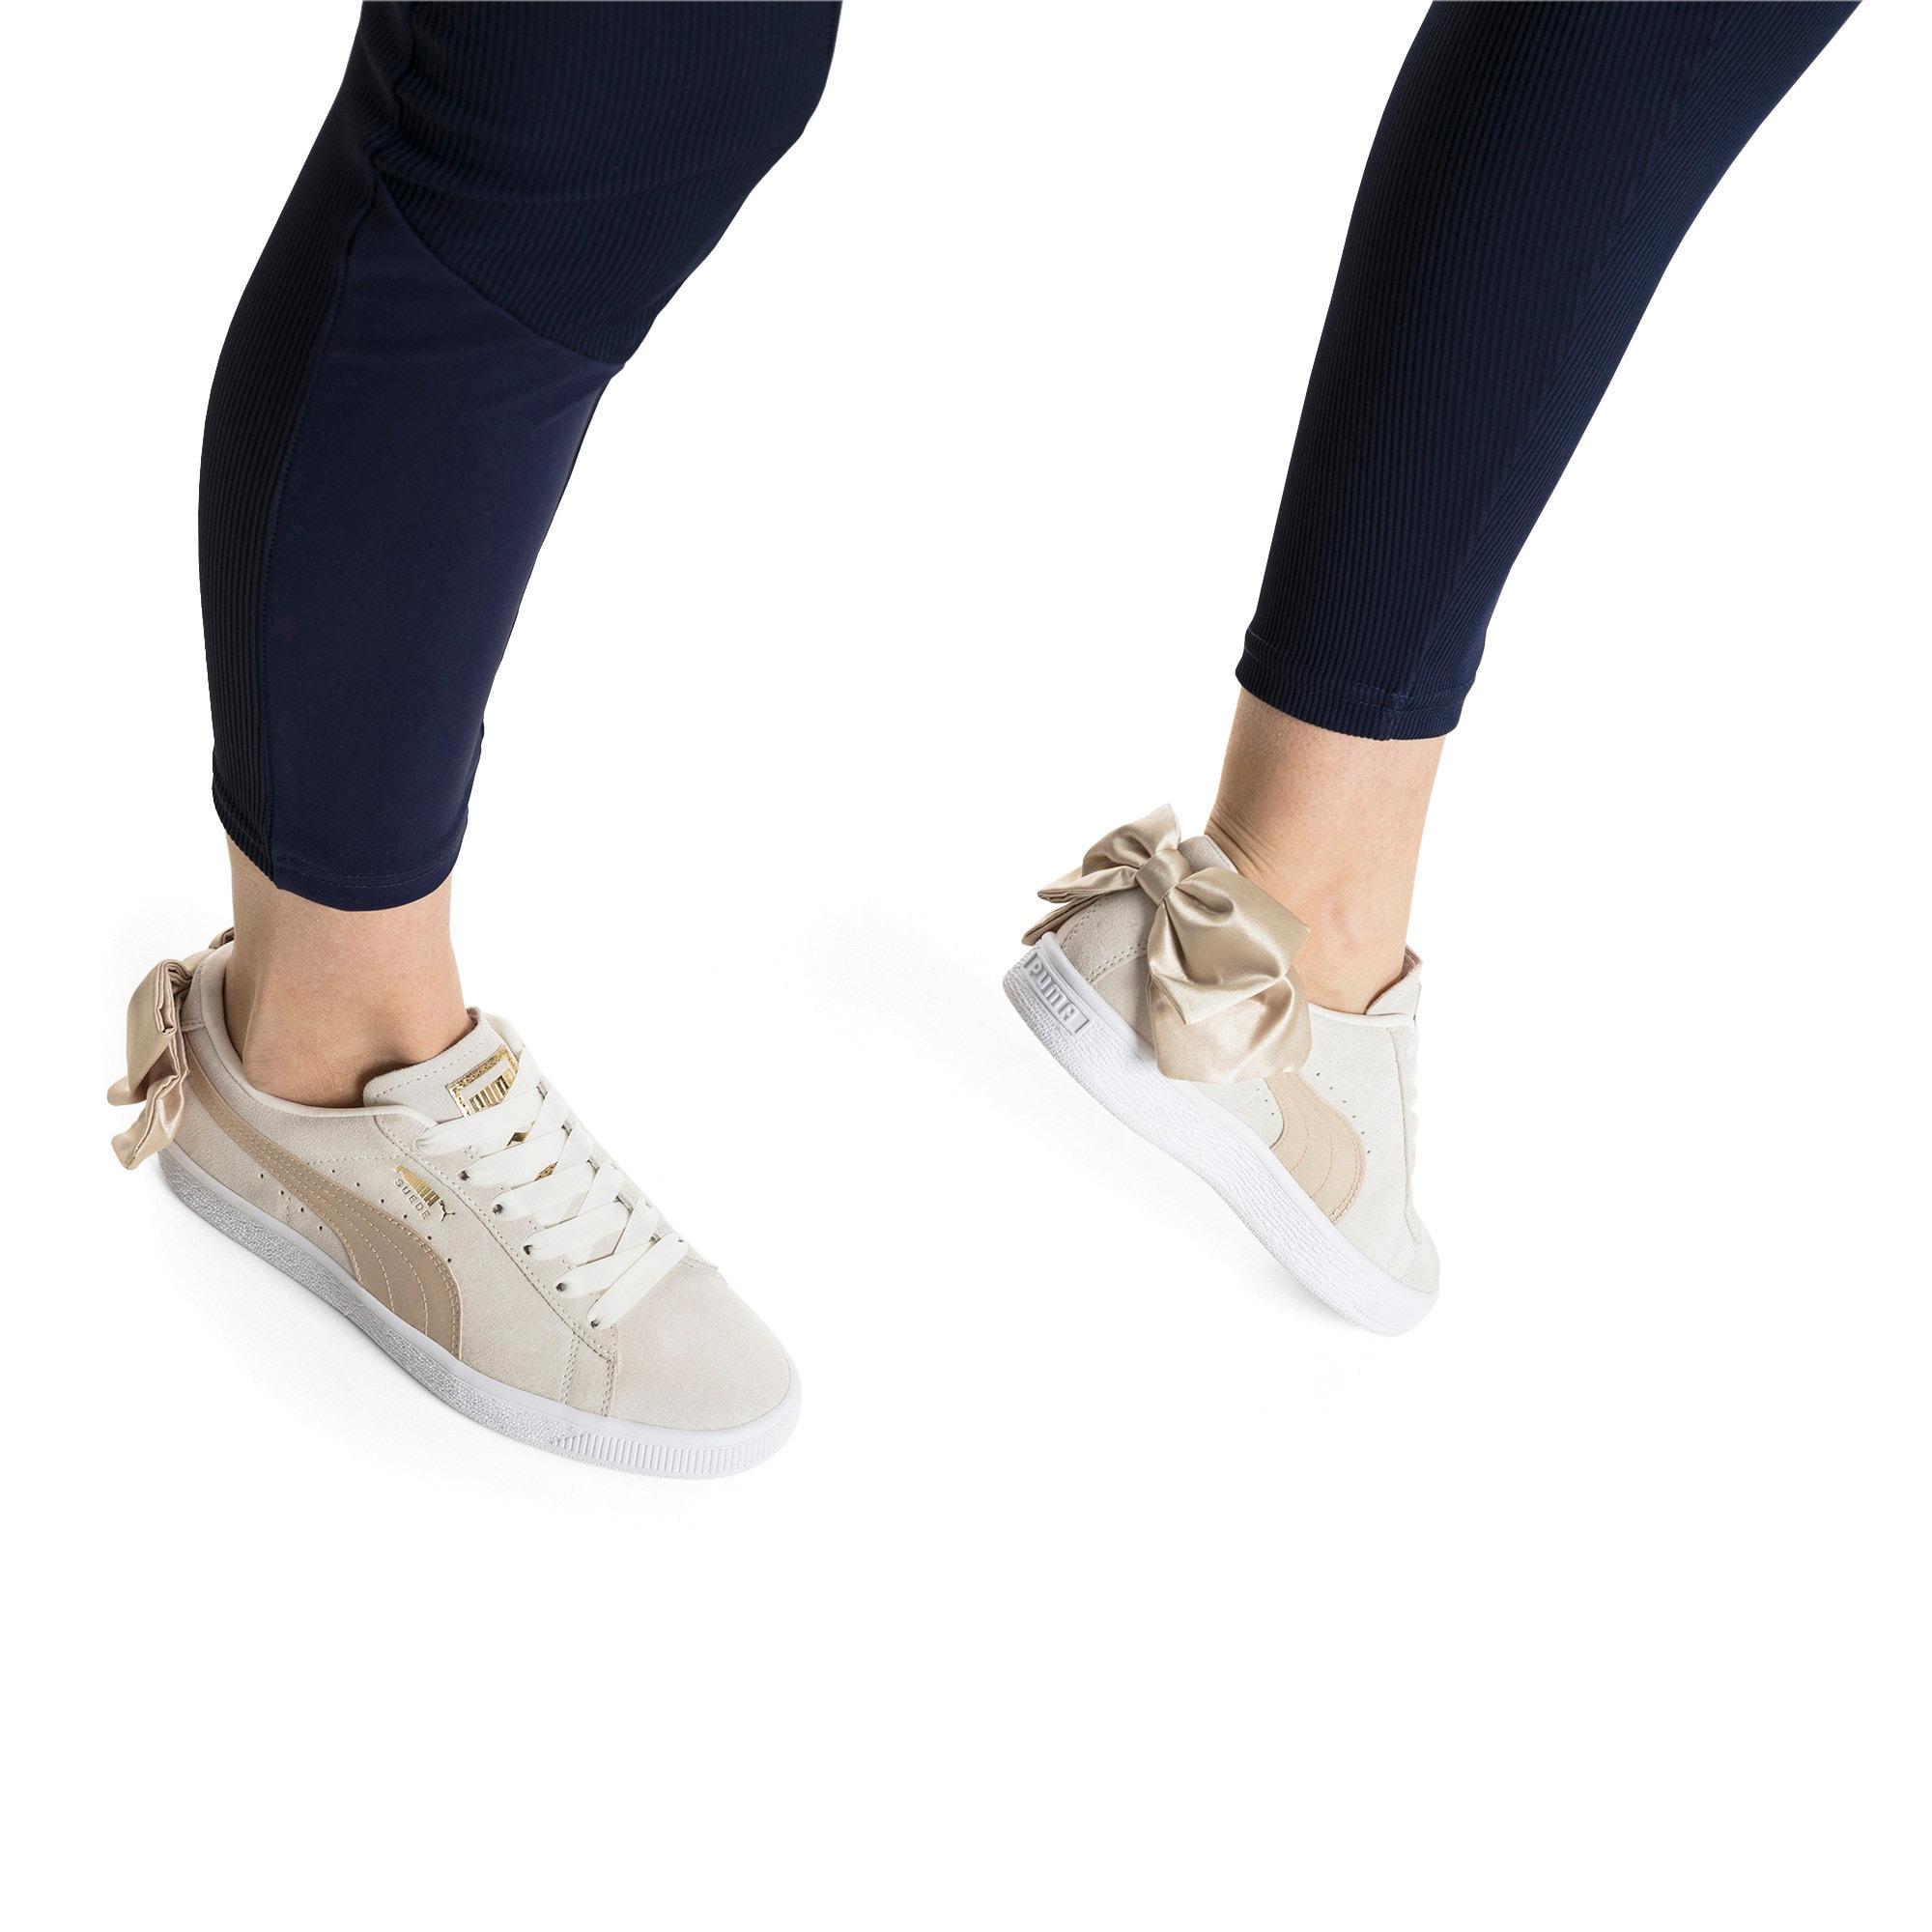 Thumbnail 7 of Suede Bow Varsity Women's Sneakers, Marshmallow-Metallic Gold, medium